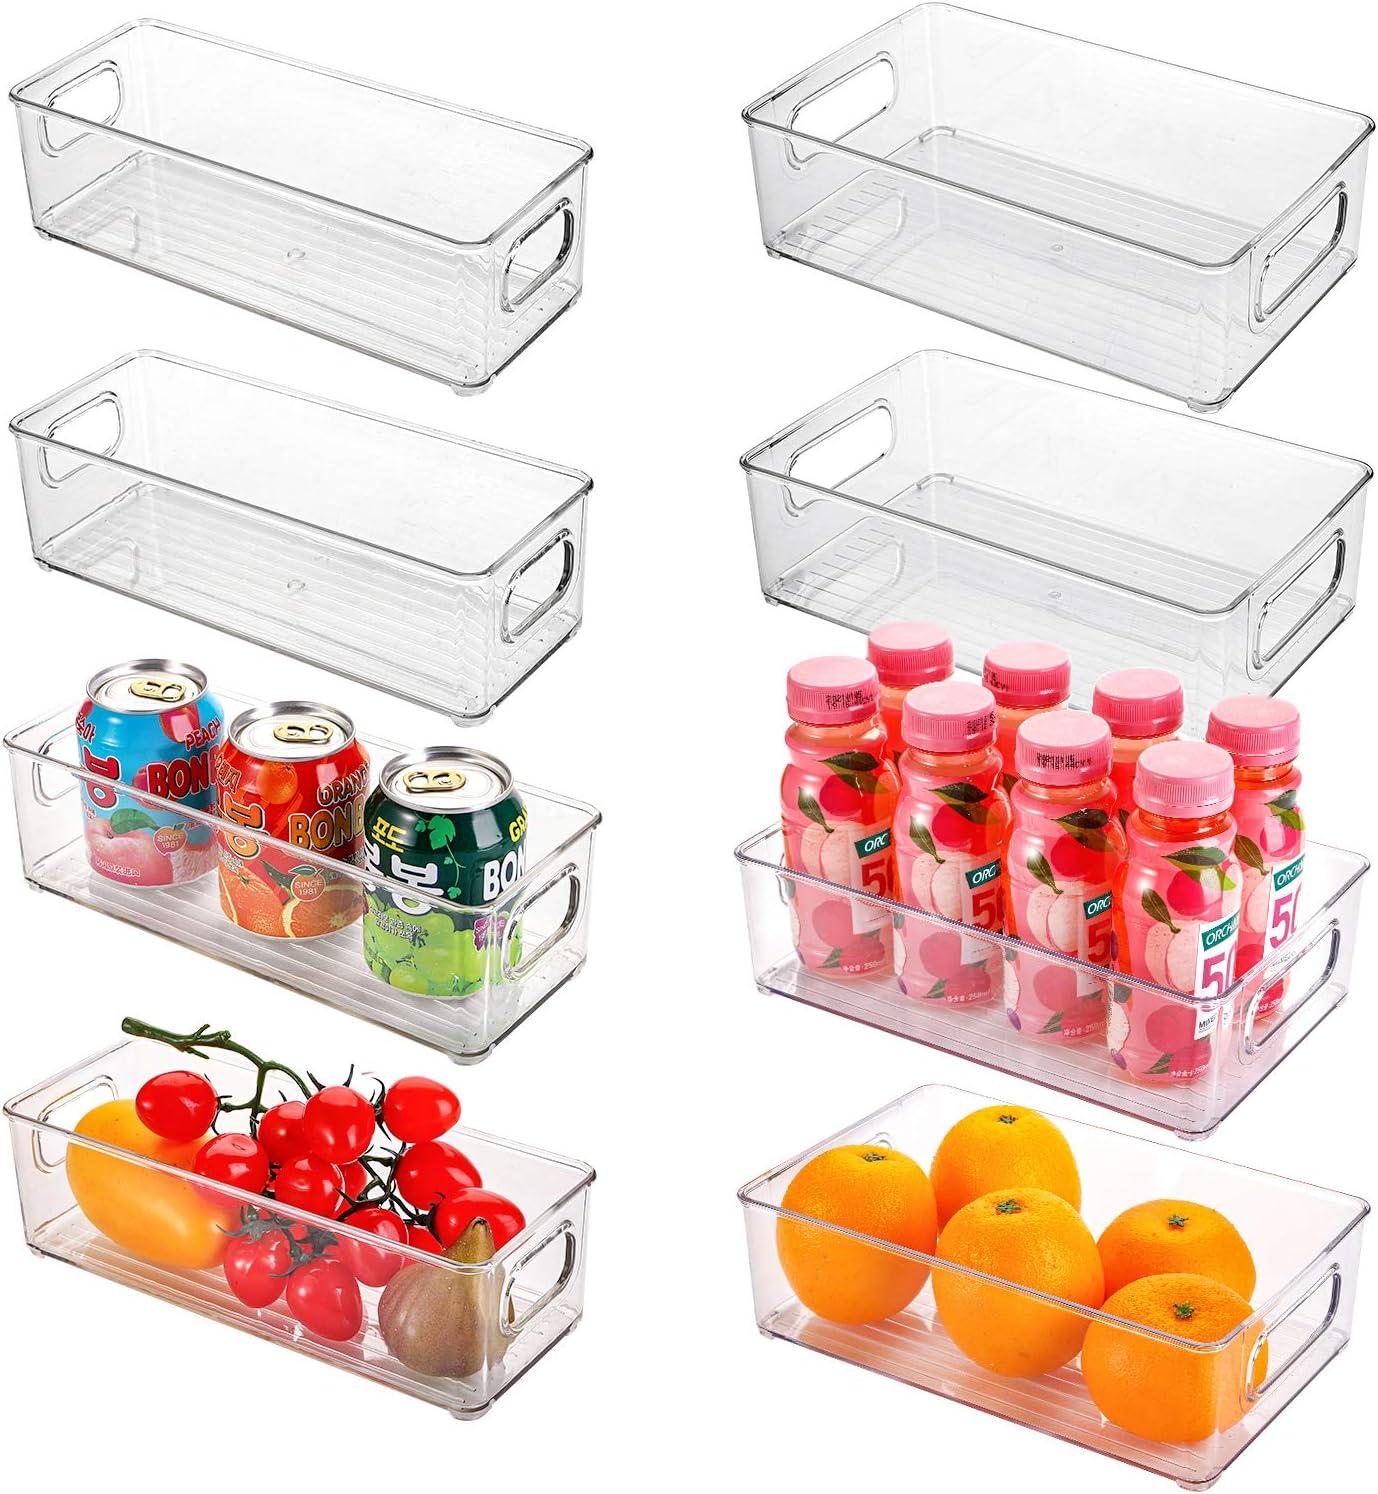 Kingrol 8 Pack Plastic Storage Bins for Freezer, Pantry, Countertop, Cabinet Organization, Stackable Food Storage Organizer with Handles, BPA Free, 10 x 6 x 3 Inch, 10 x 4 x 3 Inch